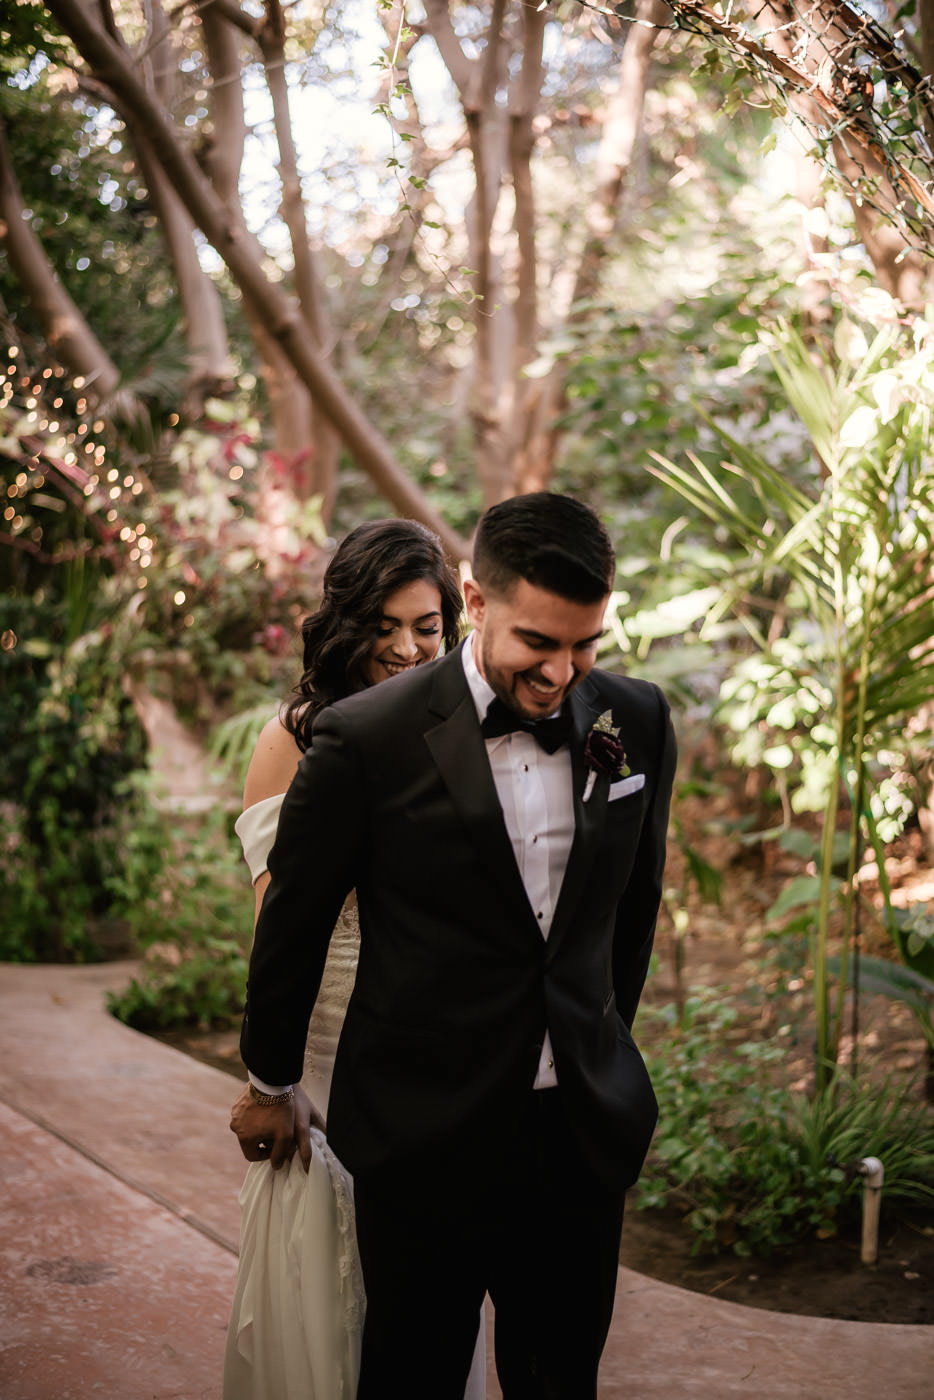 eden-gardens-wedding-photographer-romantic-24.jpg